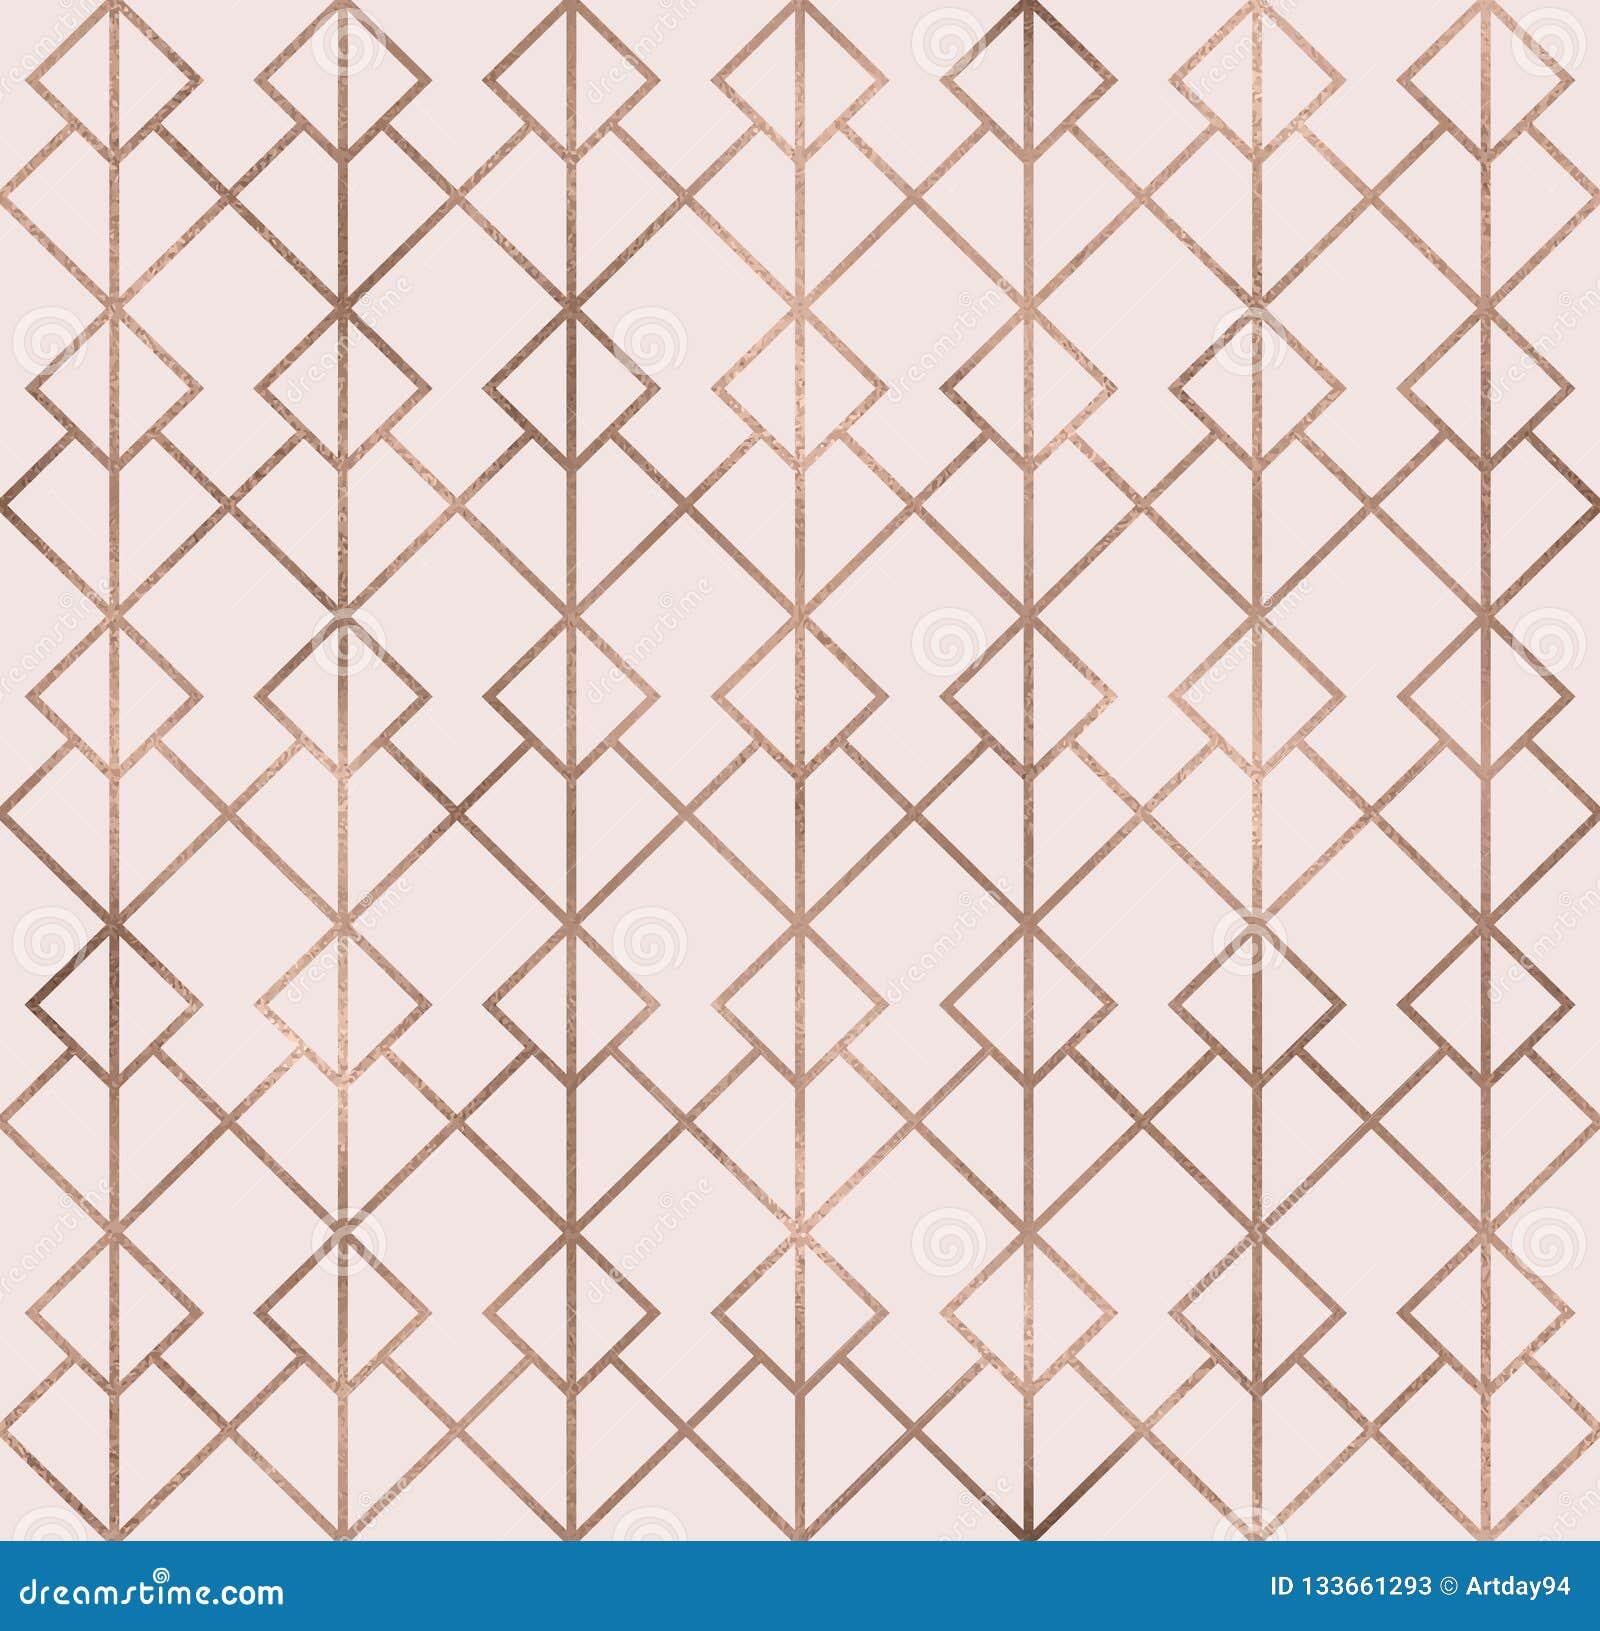 Elegant Sparkle Geometric Seamless Pattern With Rose Gold Foil